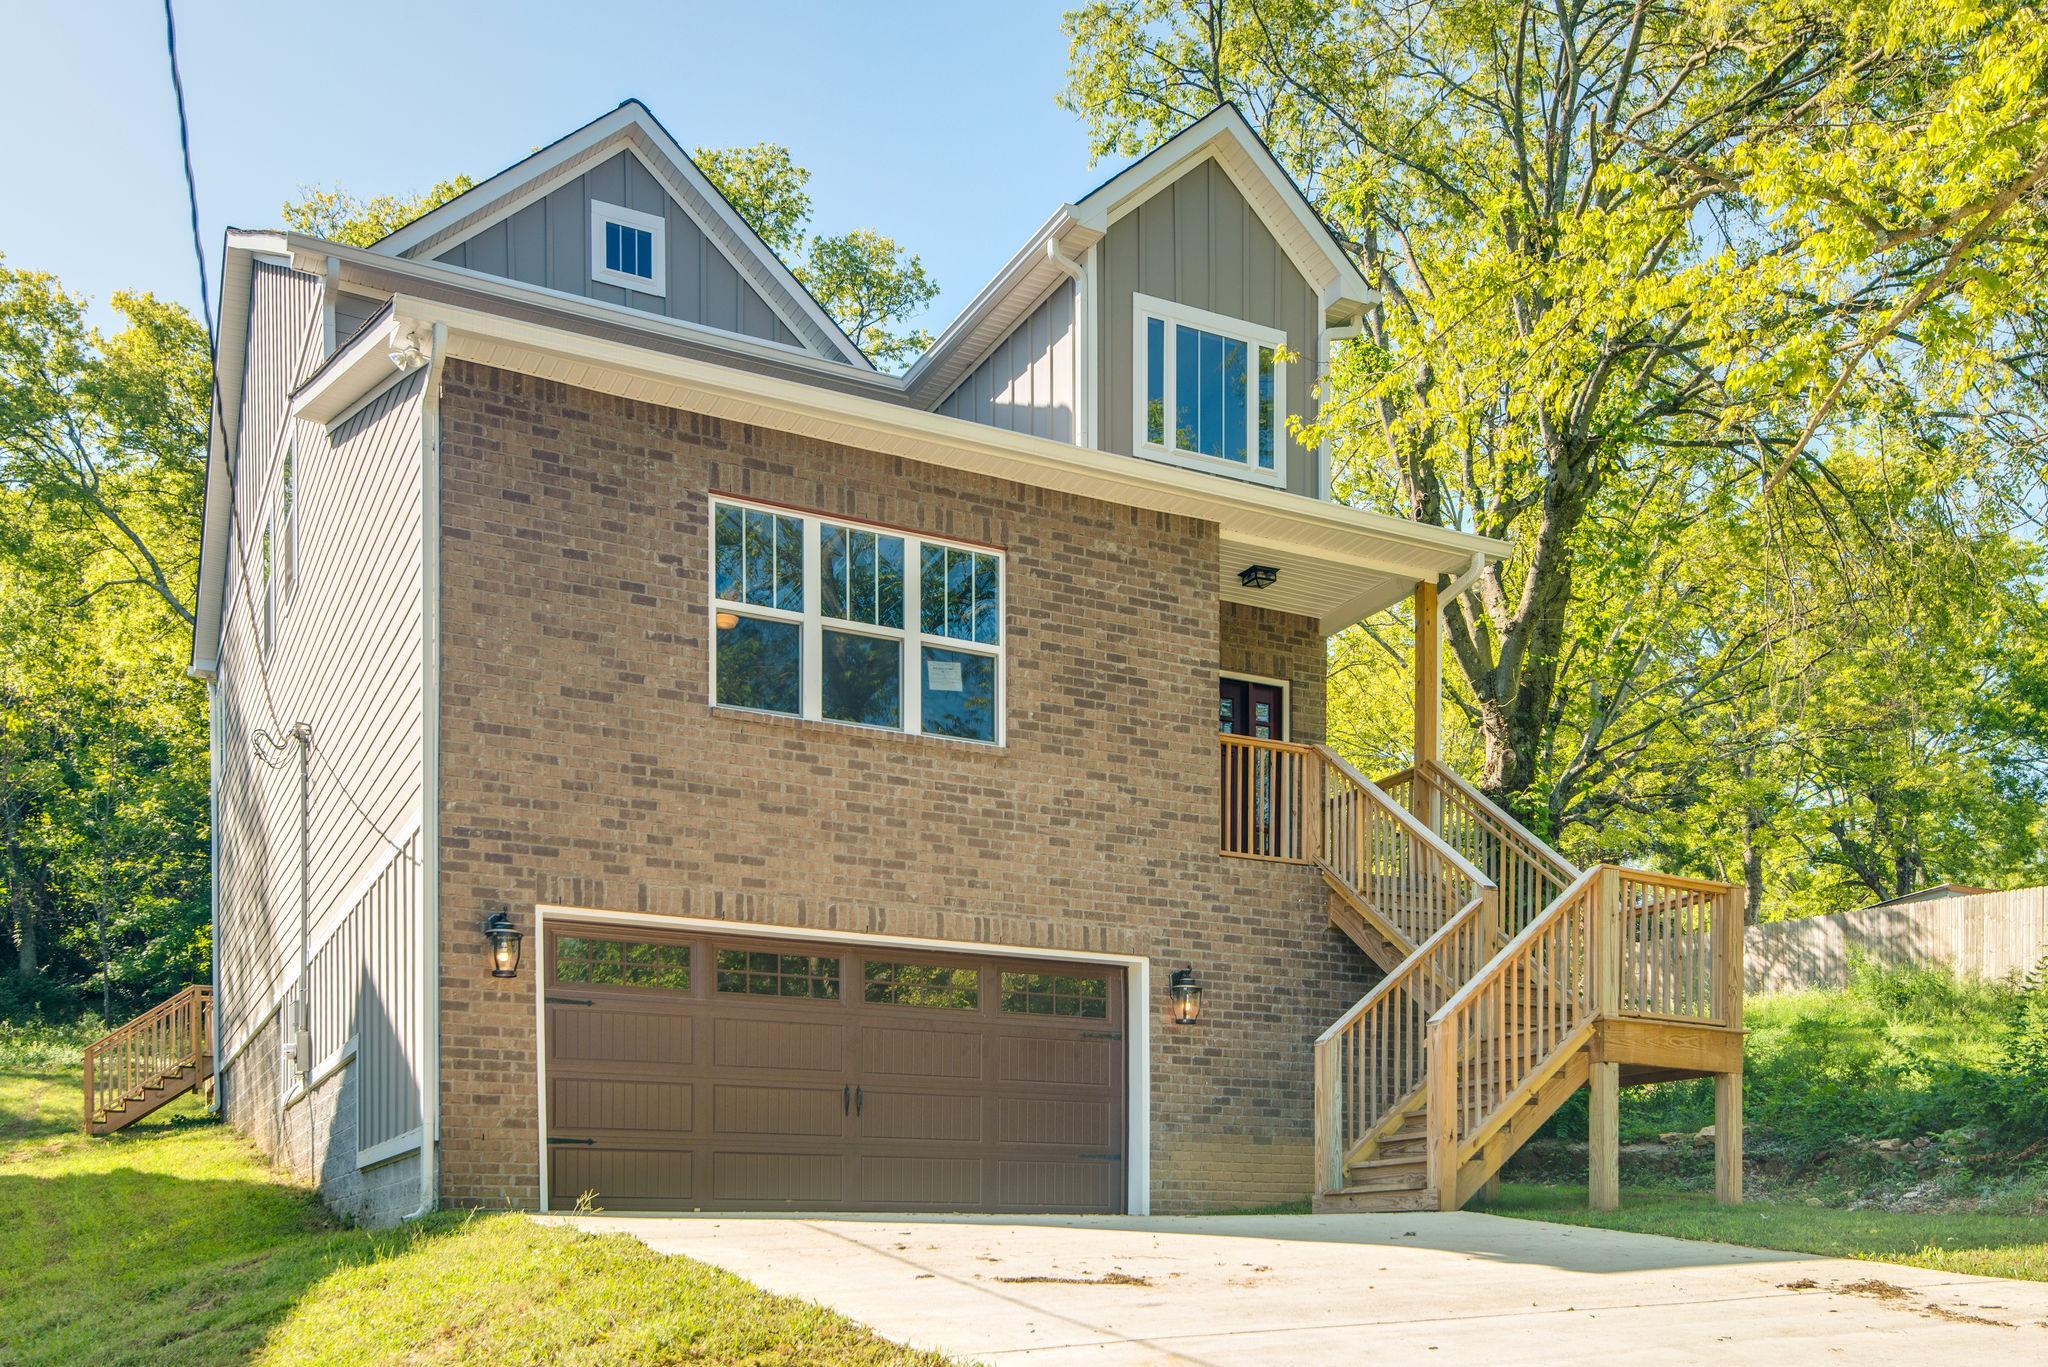 3850 Hutson Ave, Nashville, TN 37216 - Nashville, TN real estate listing